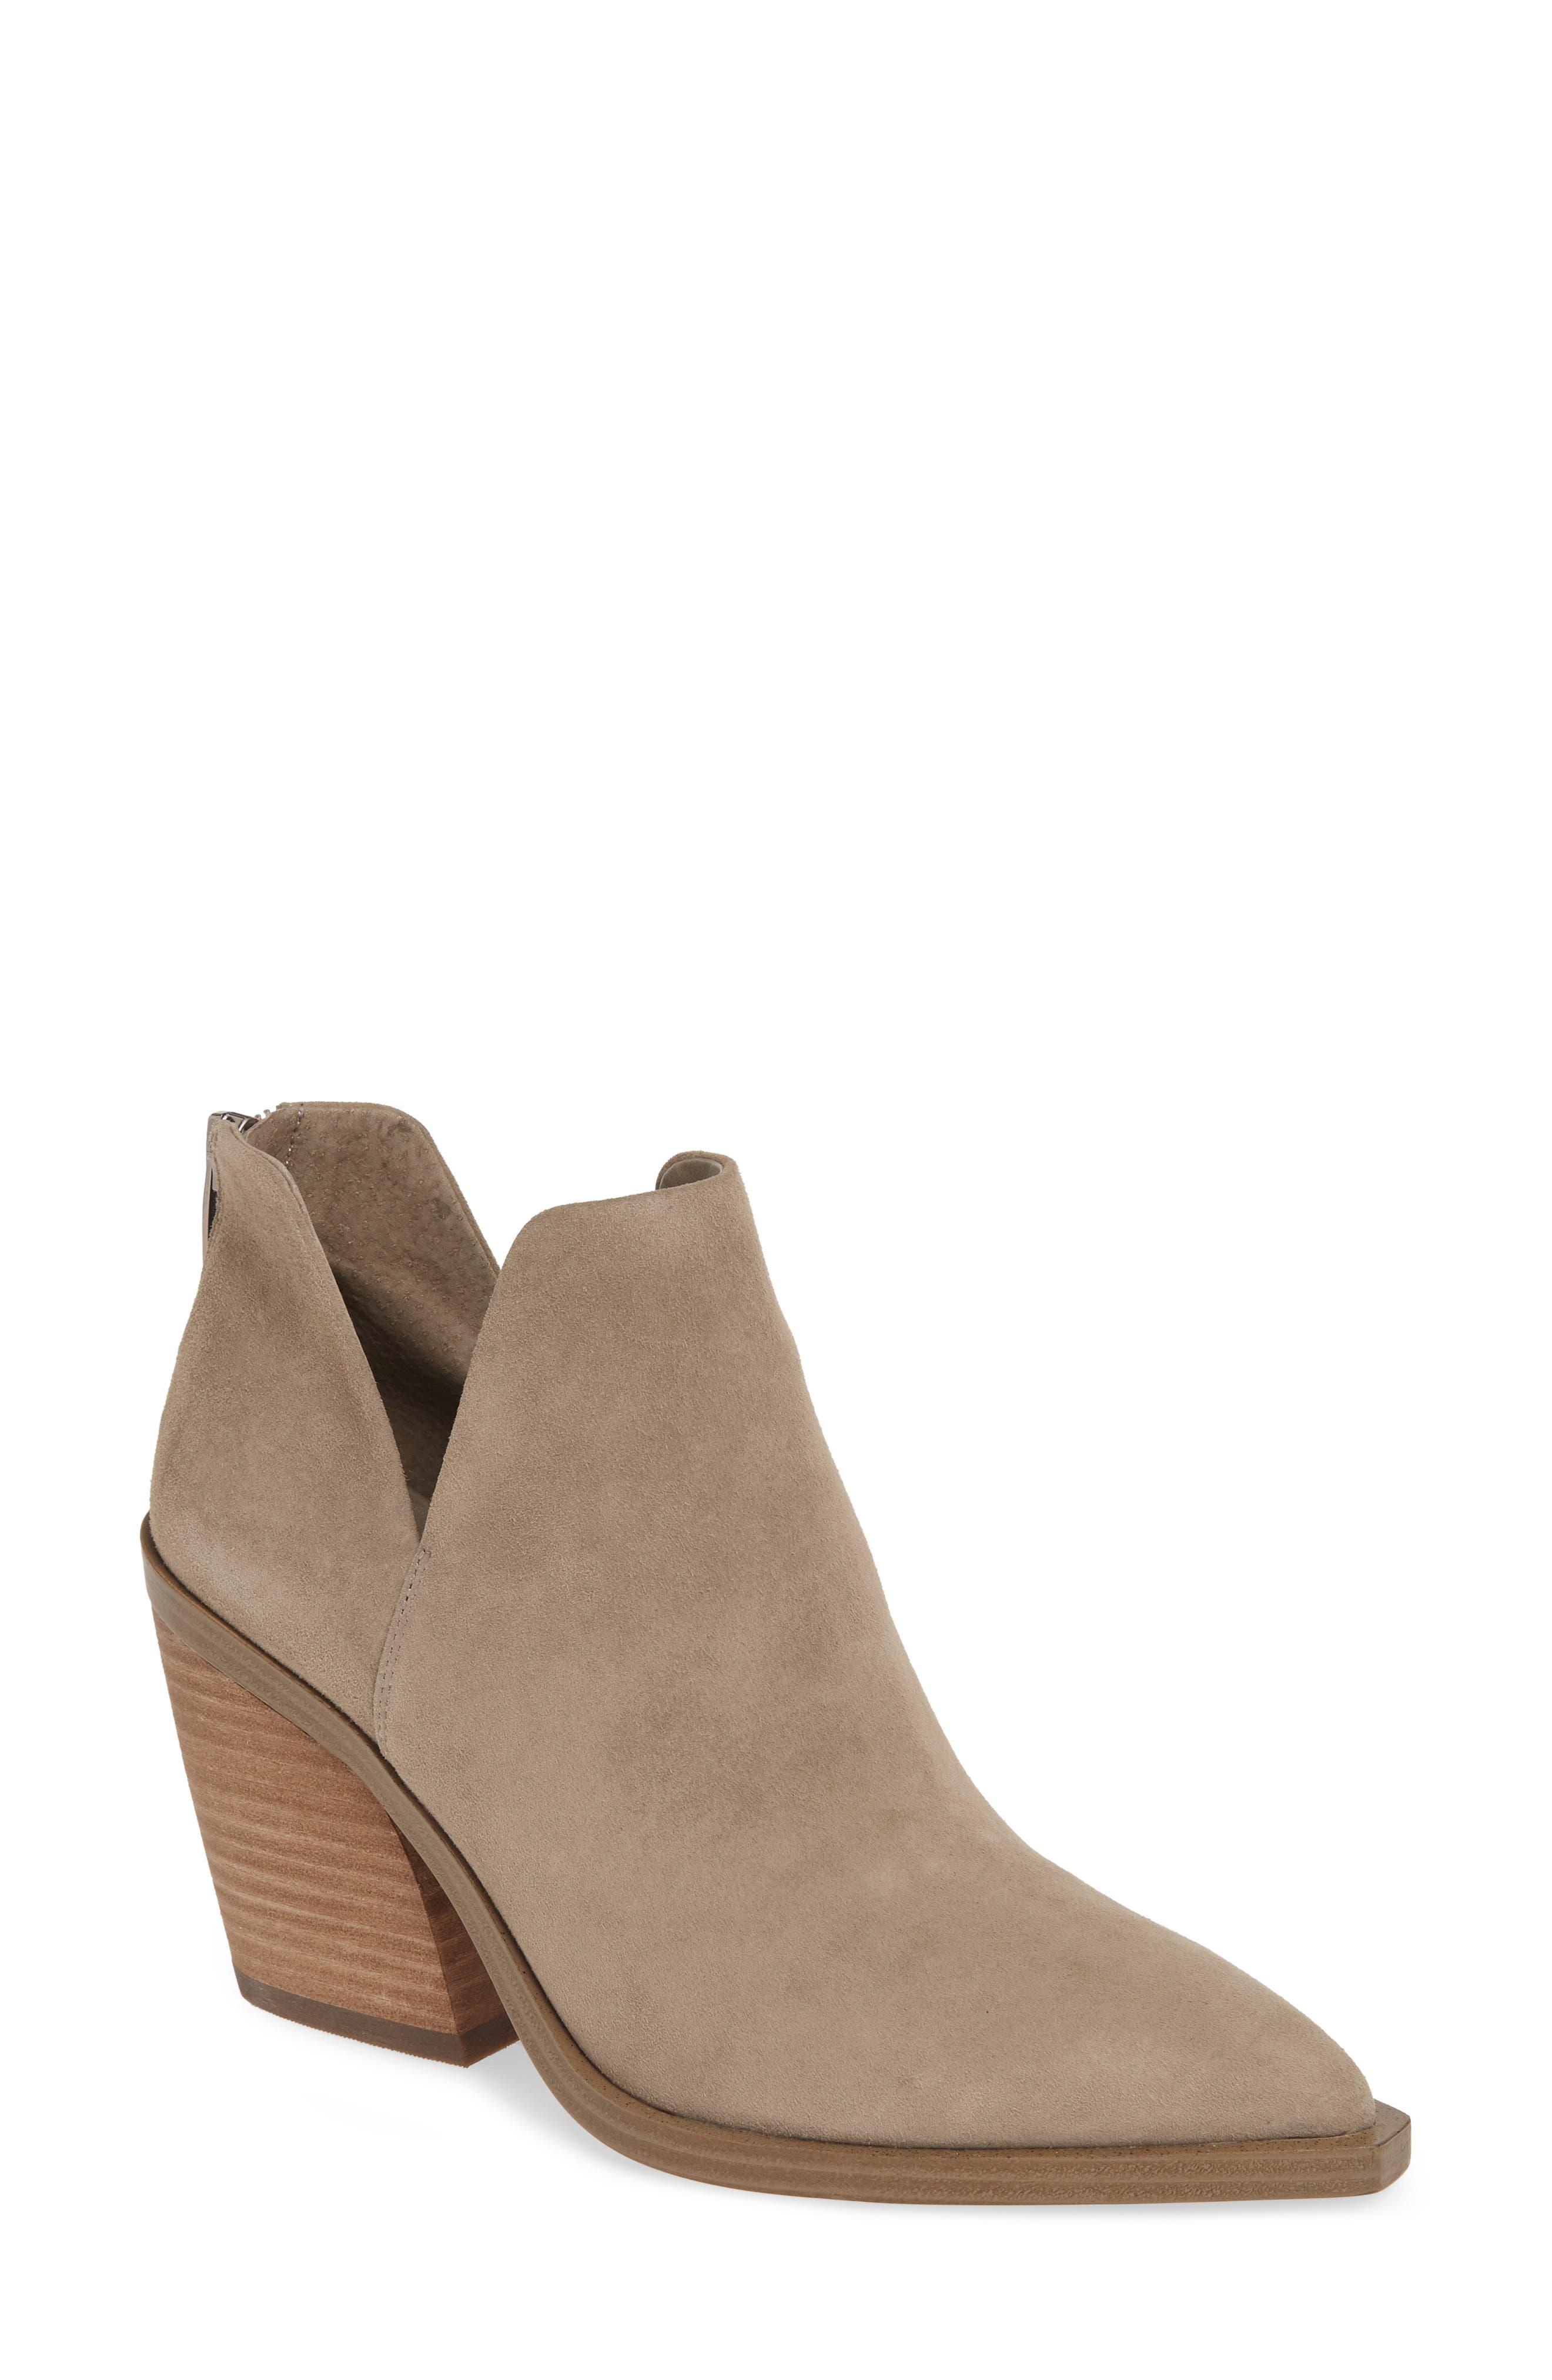 Women's Shoes | Nordstrom